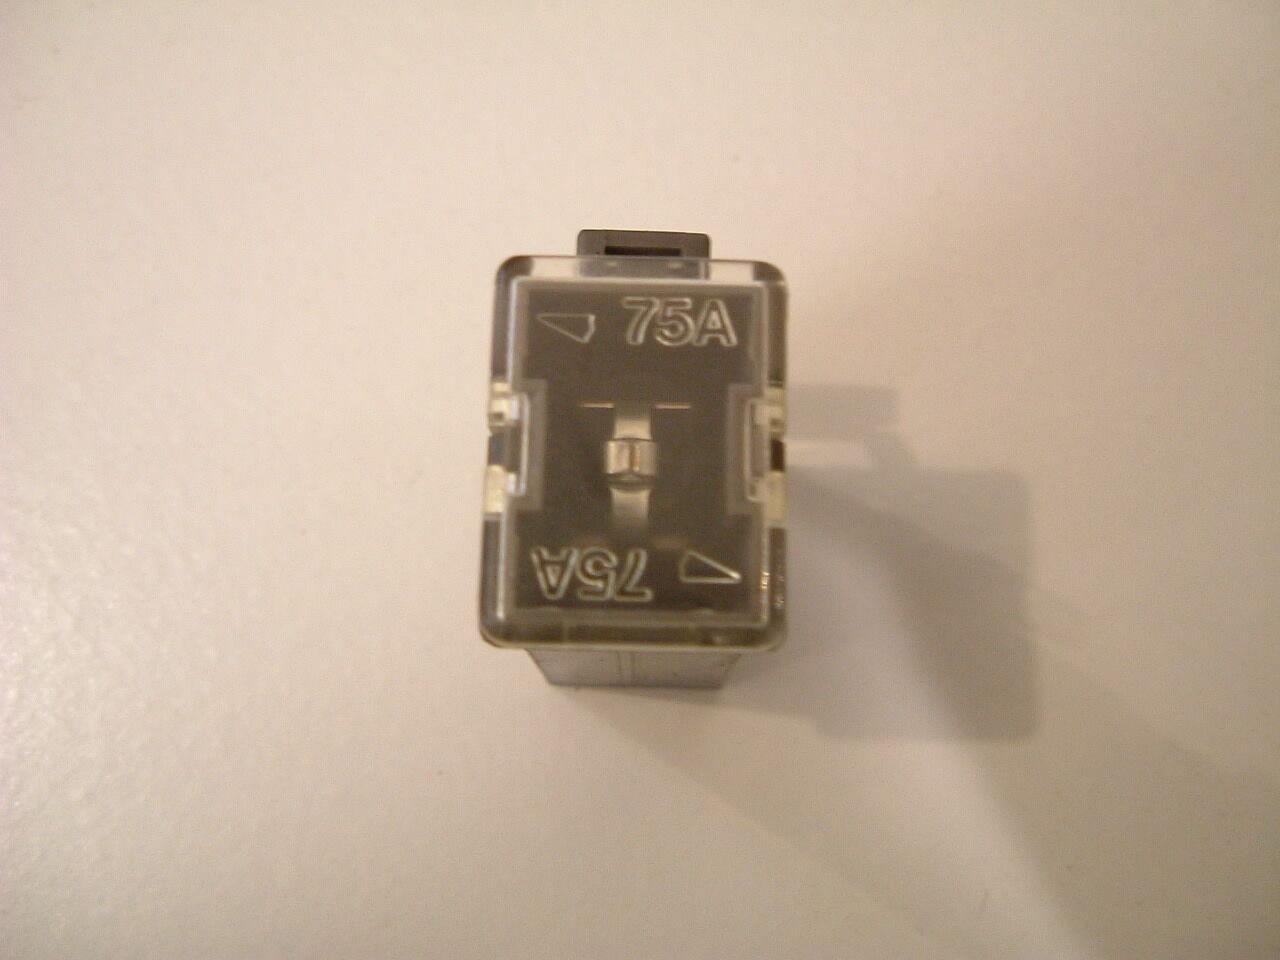 75 amp fuse nissan maxima 95 99 altima 93 97 alternator fl75a 75a 75amp fuse buy3 1